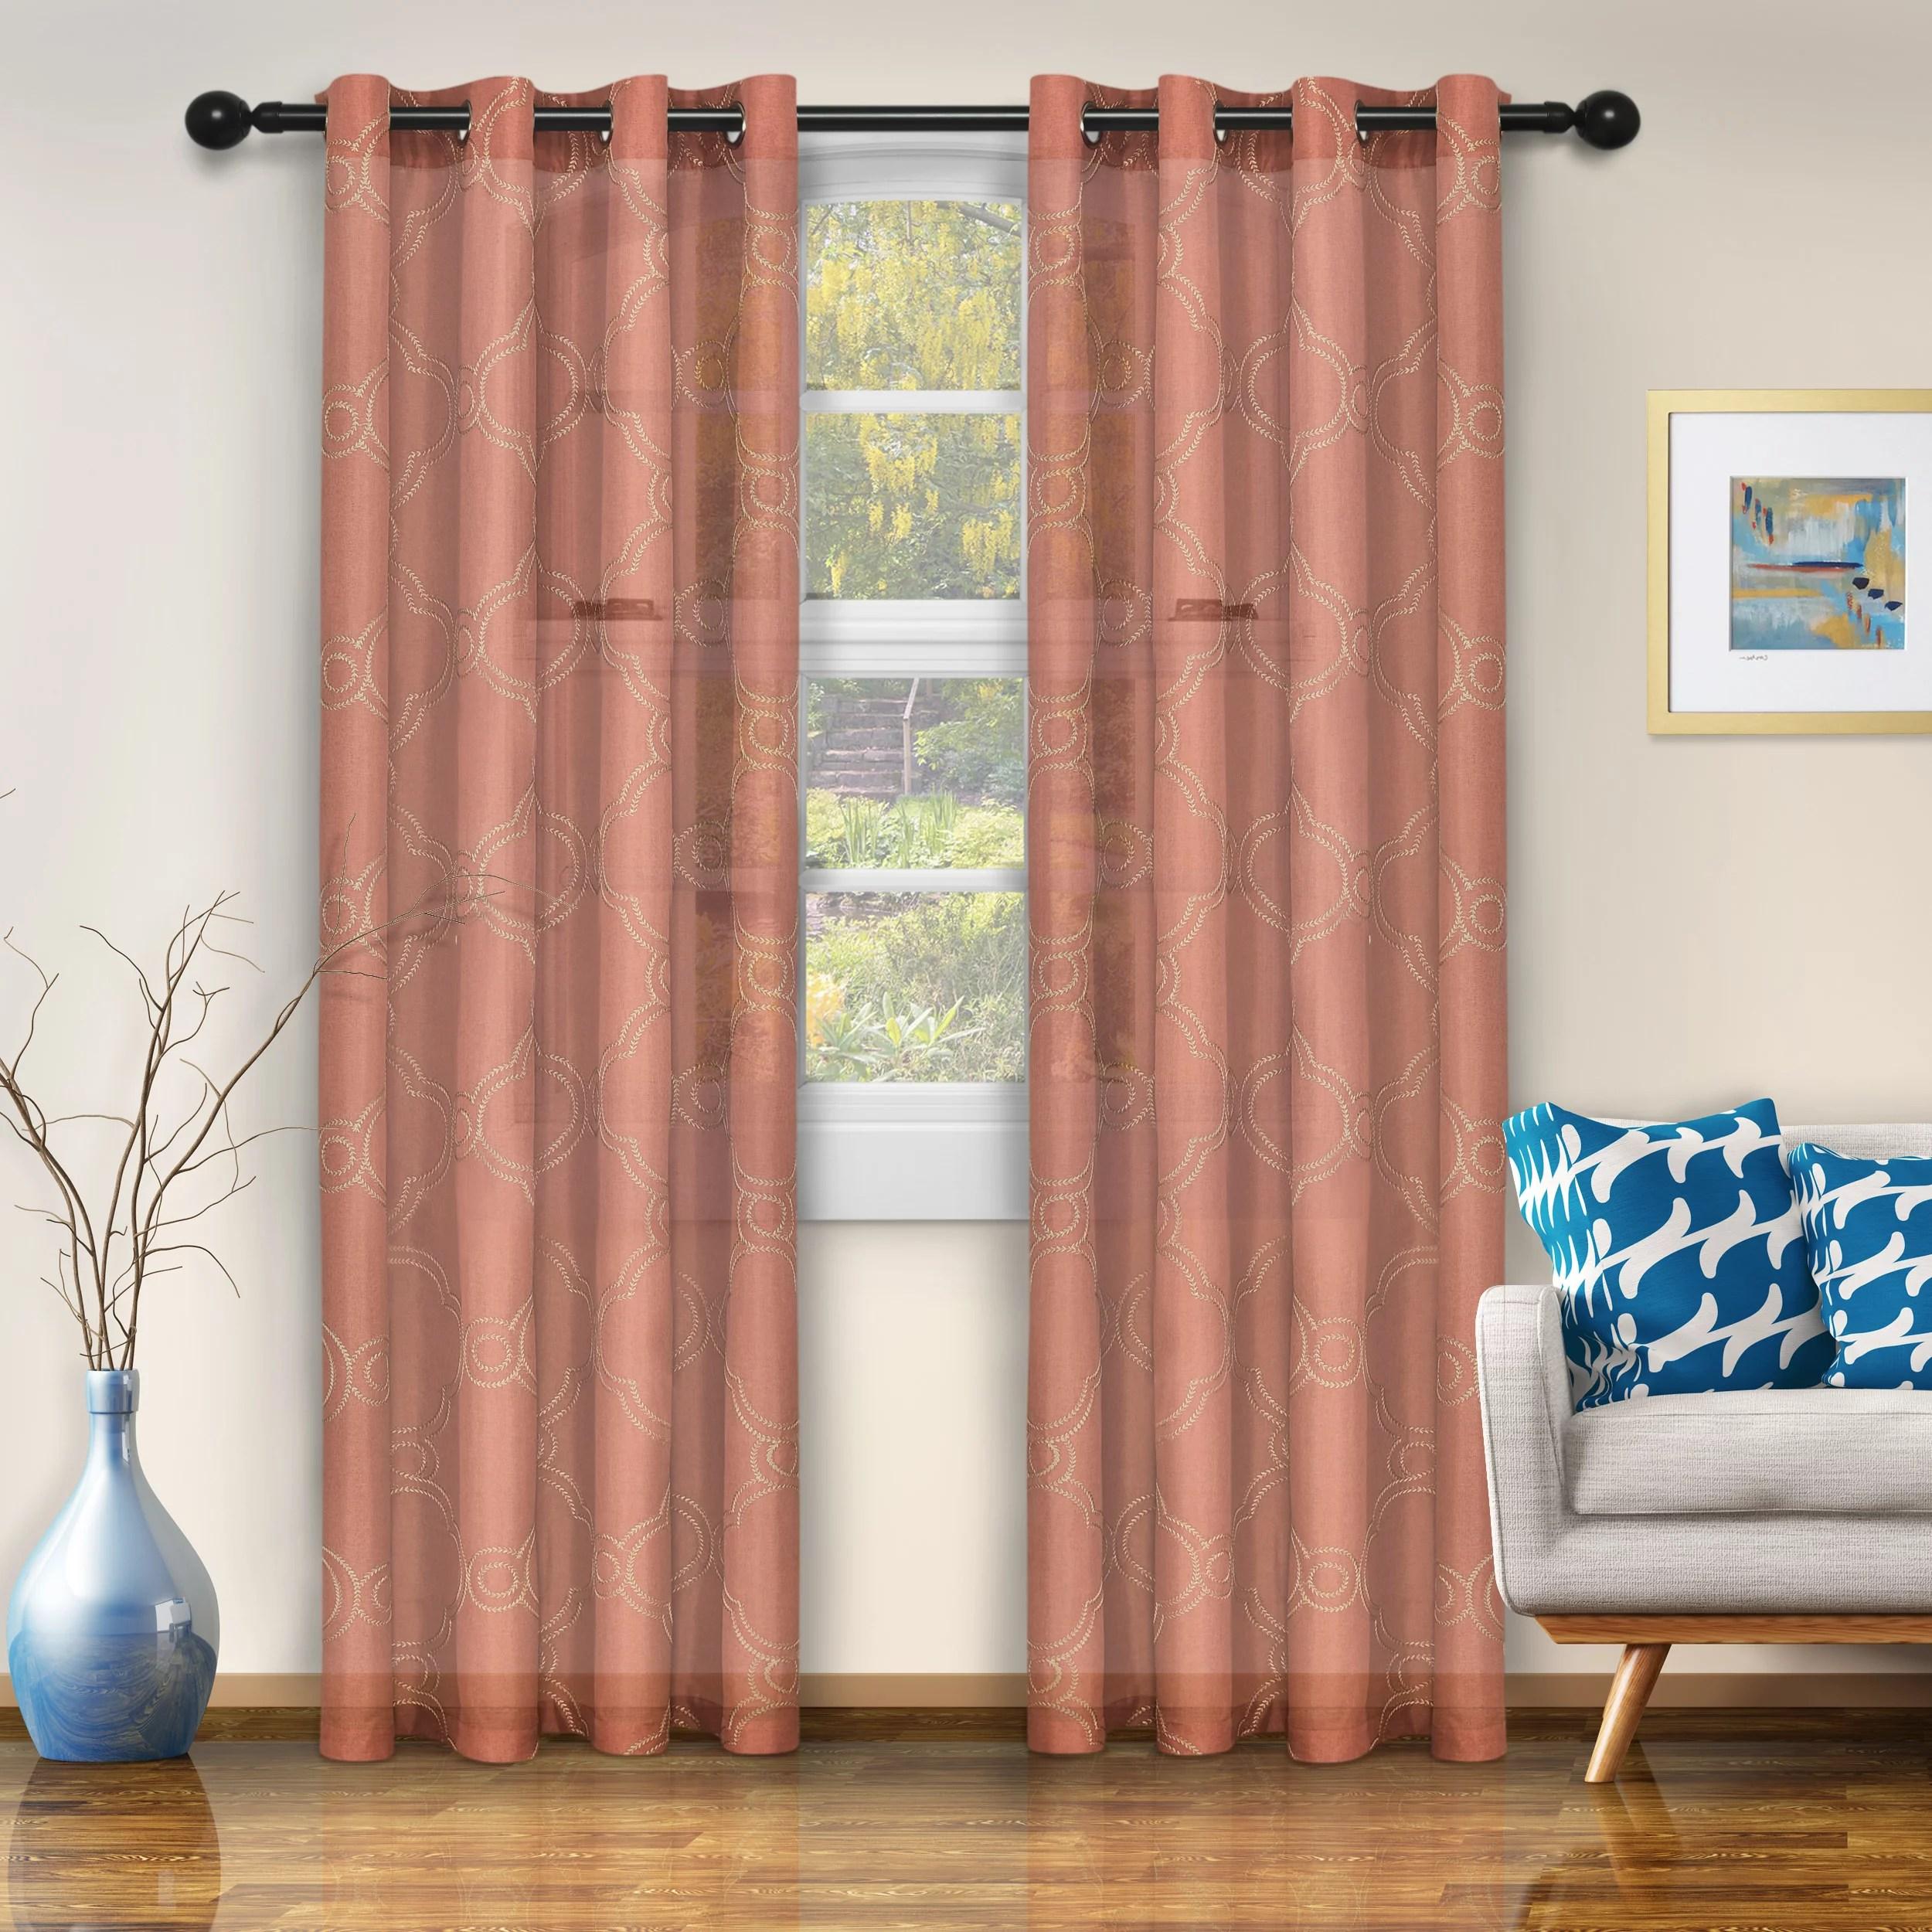 superior semi sheer moroccan printed curtain panels set of 2 rust walmart com